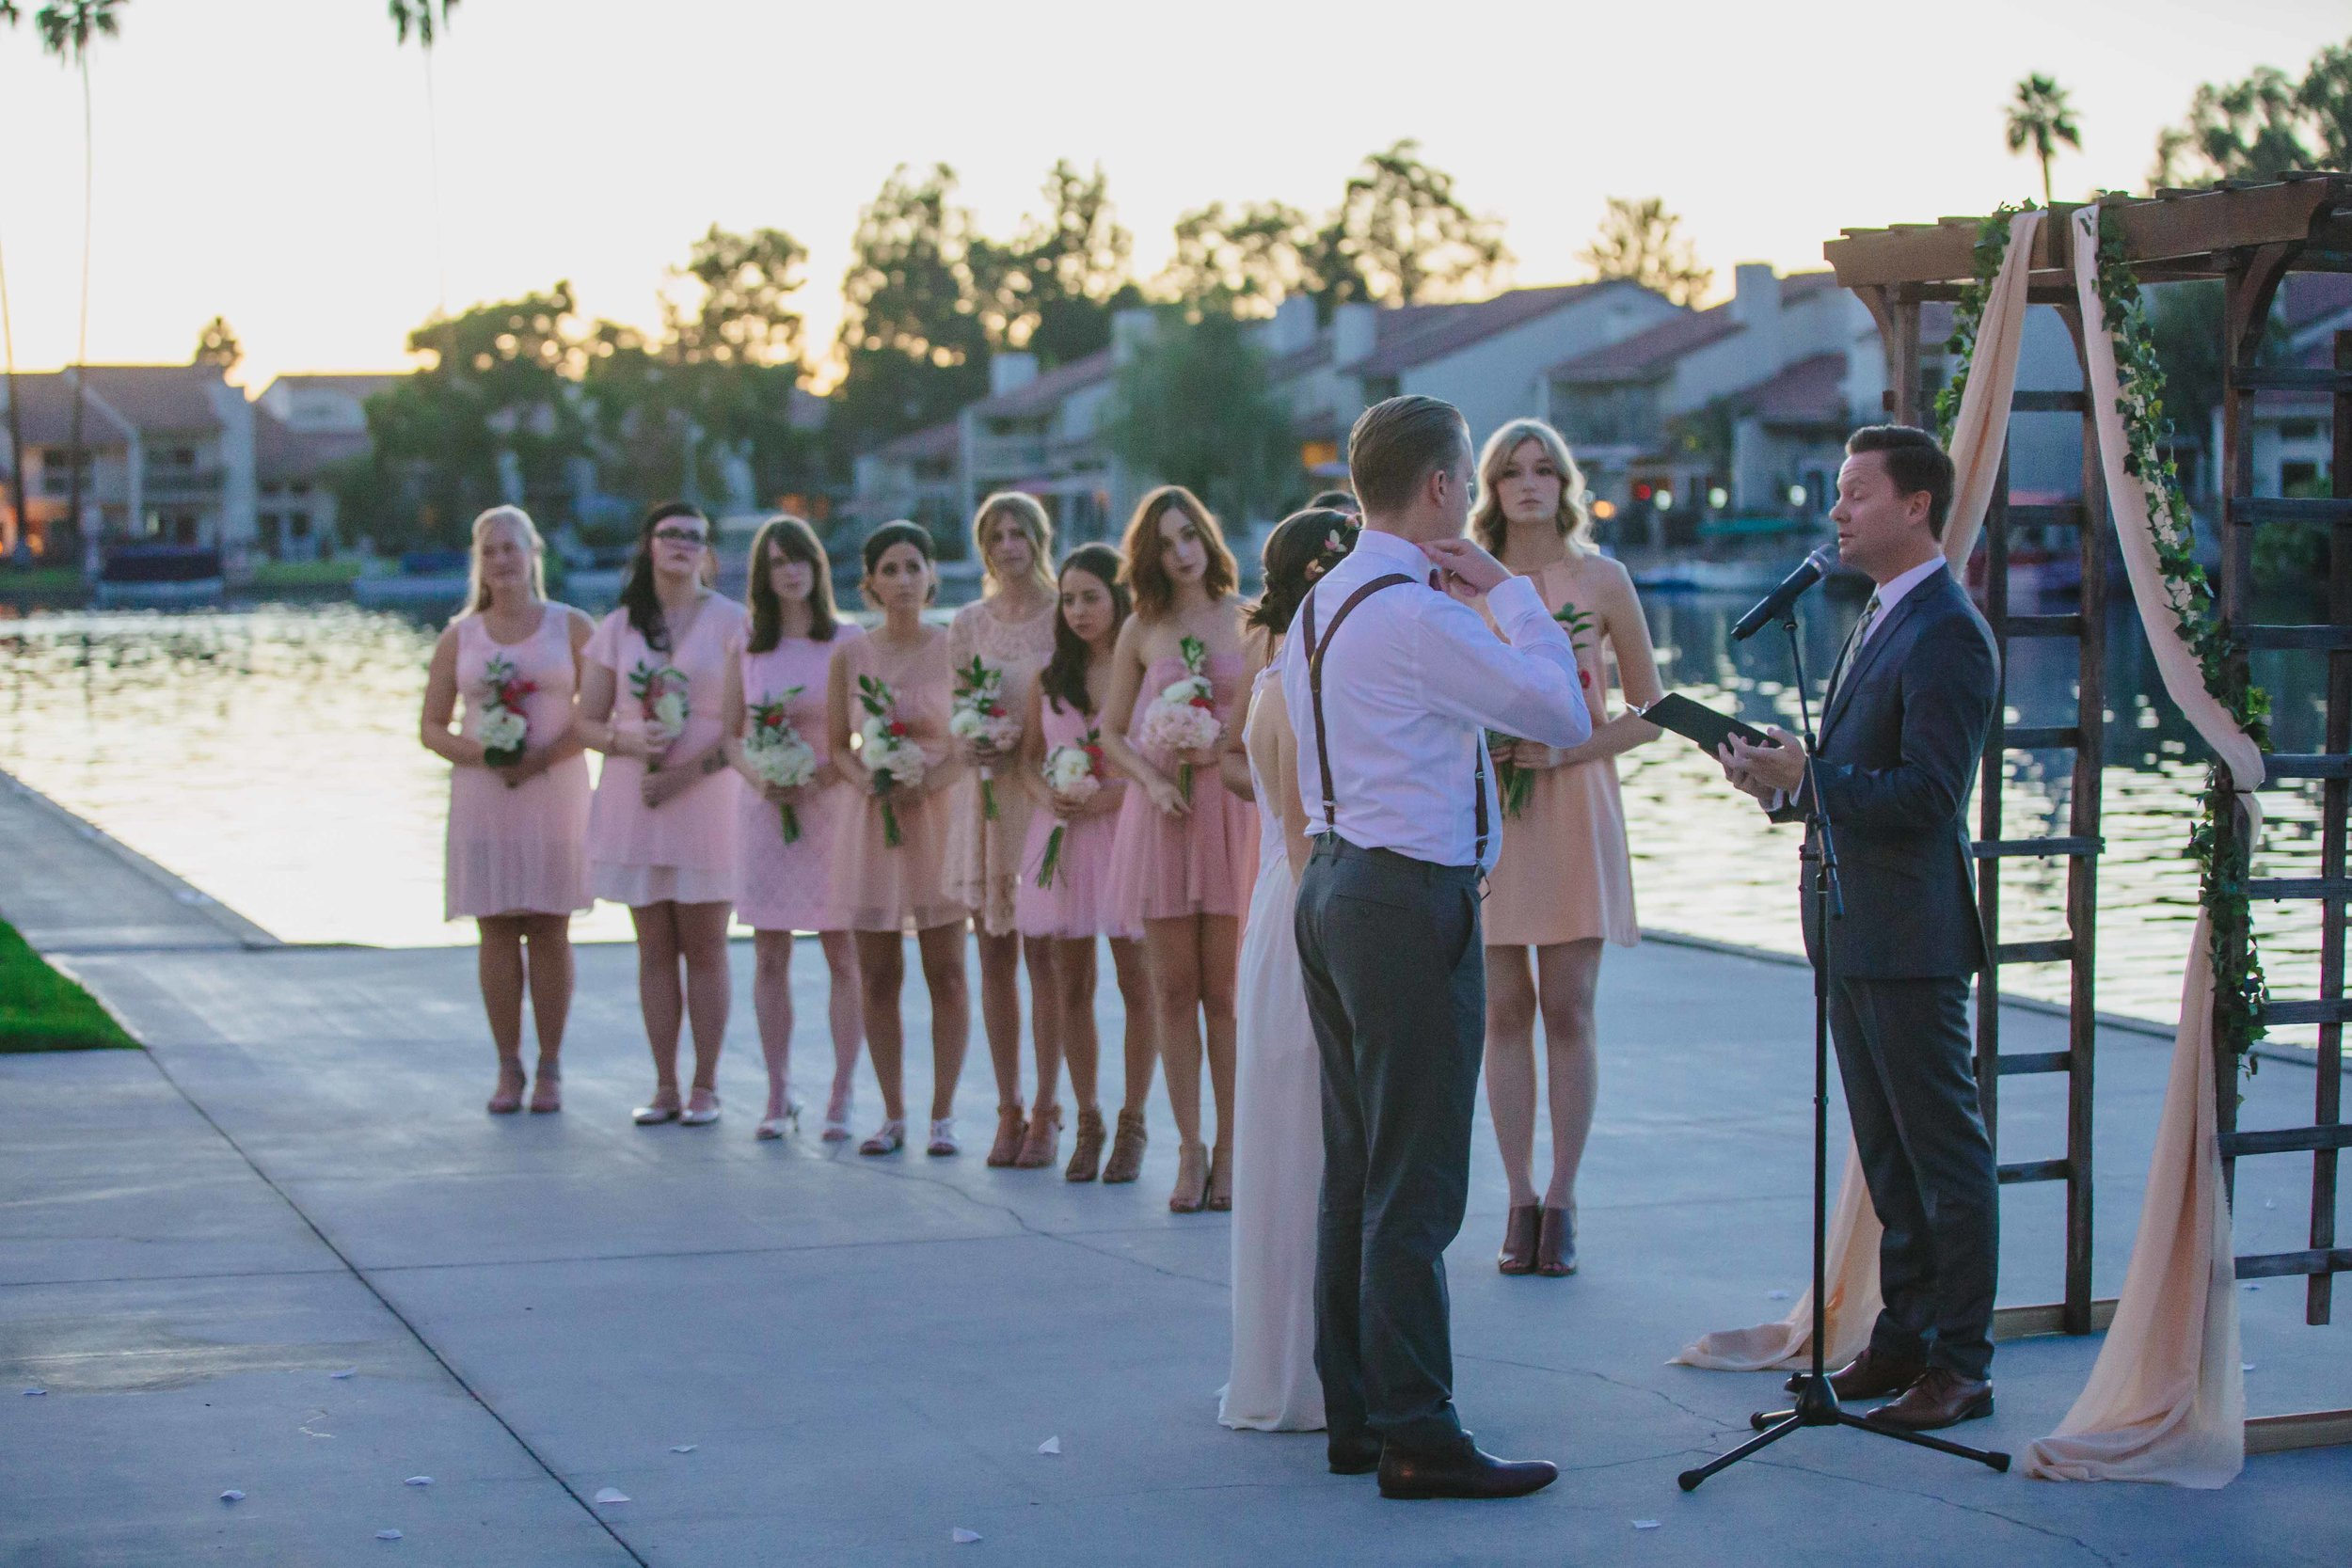 20141024-DePartee-Wedding-APavone-050-sm.jpg